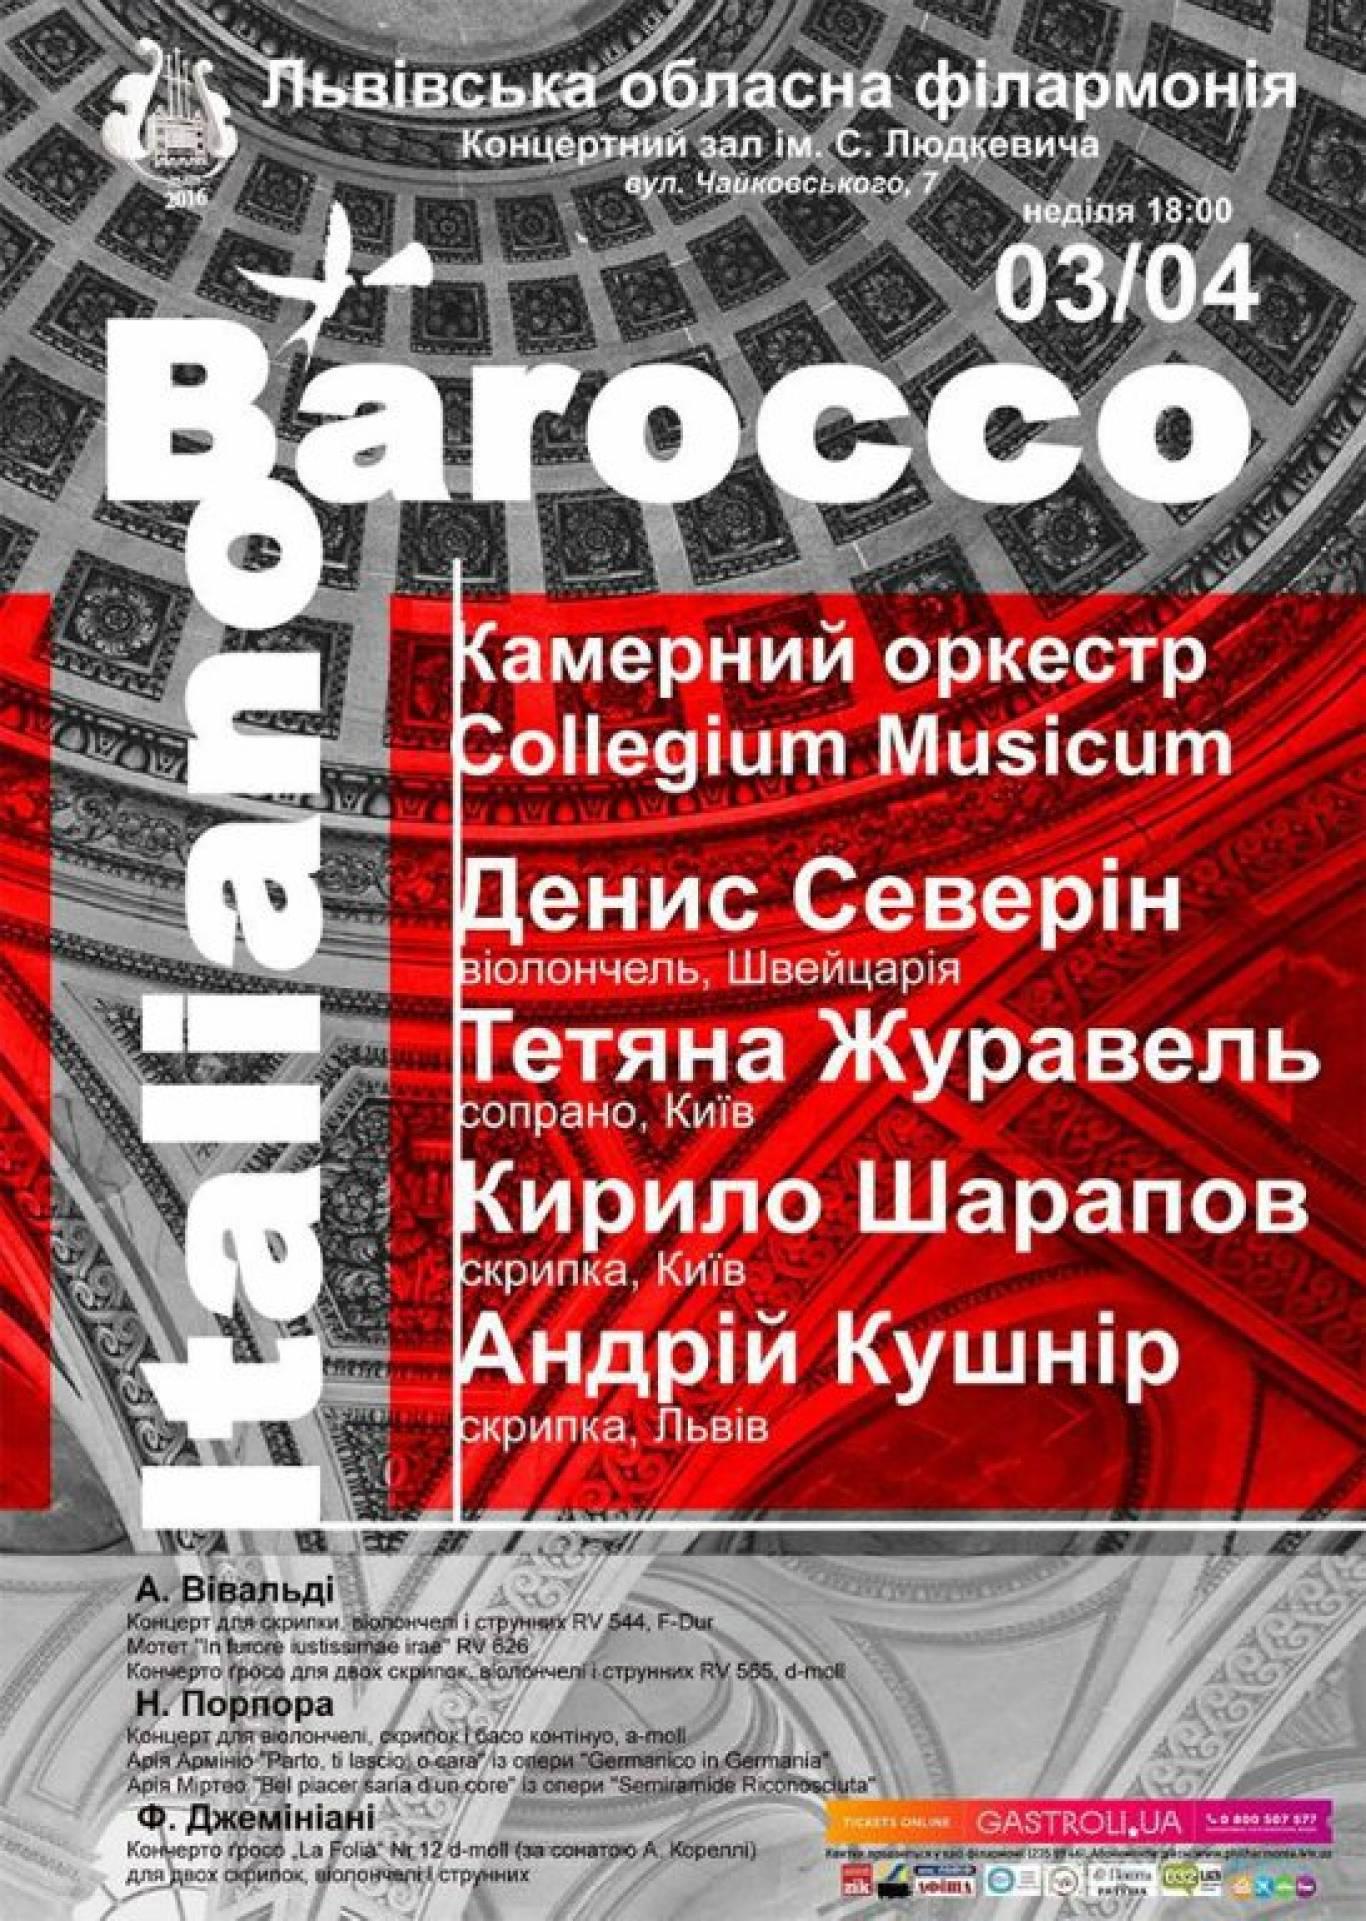 Концерт Barocco Italiano